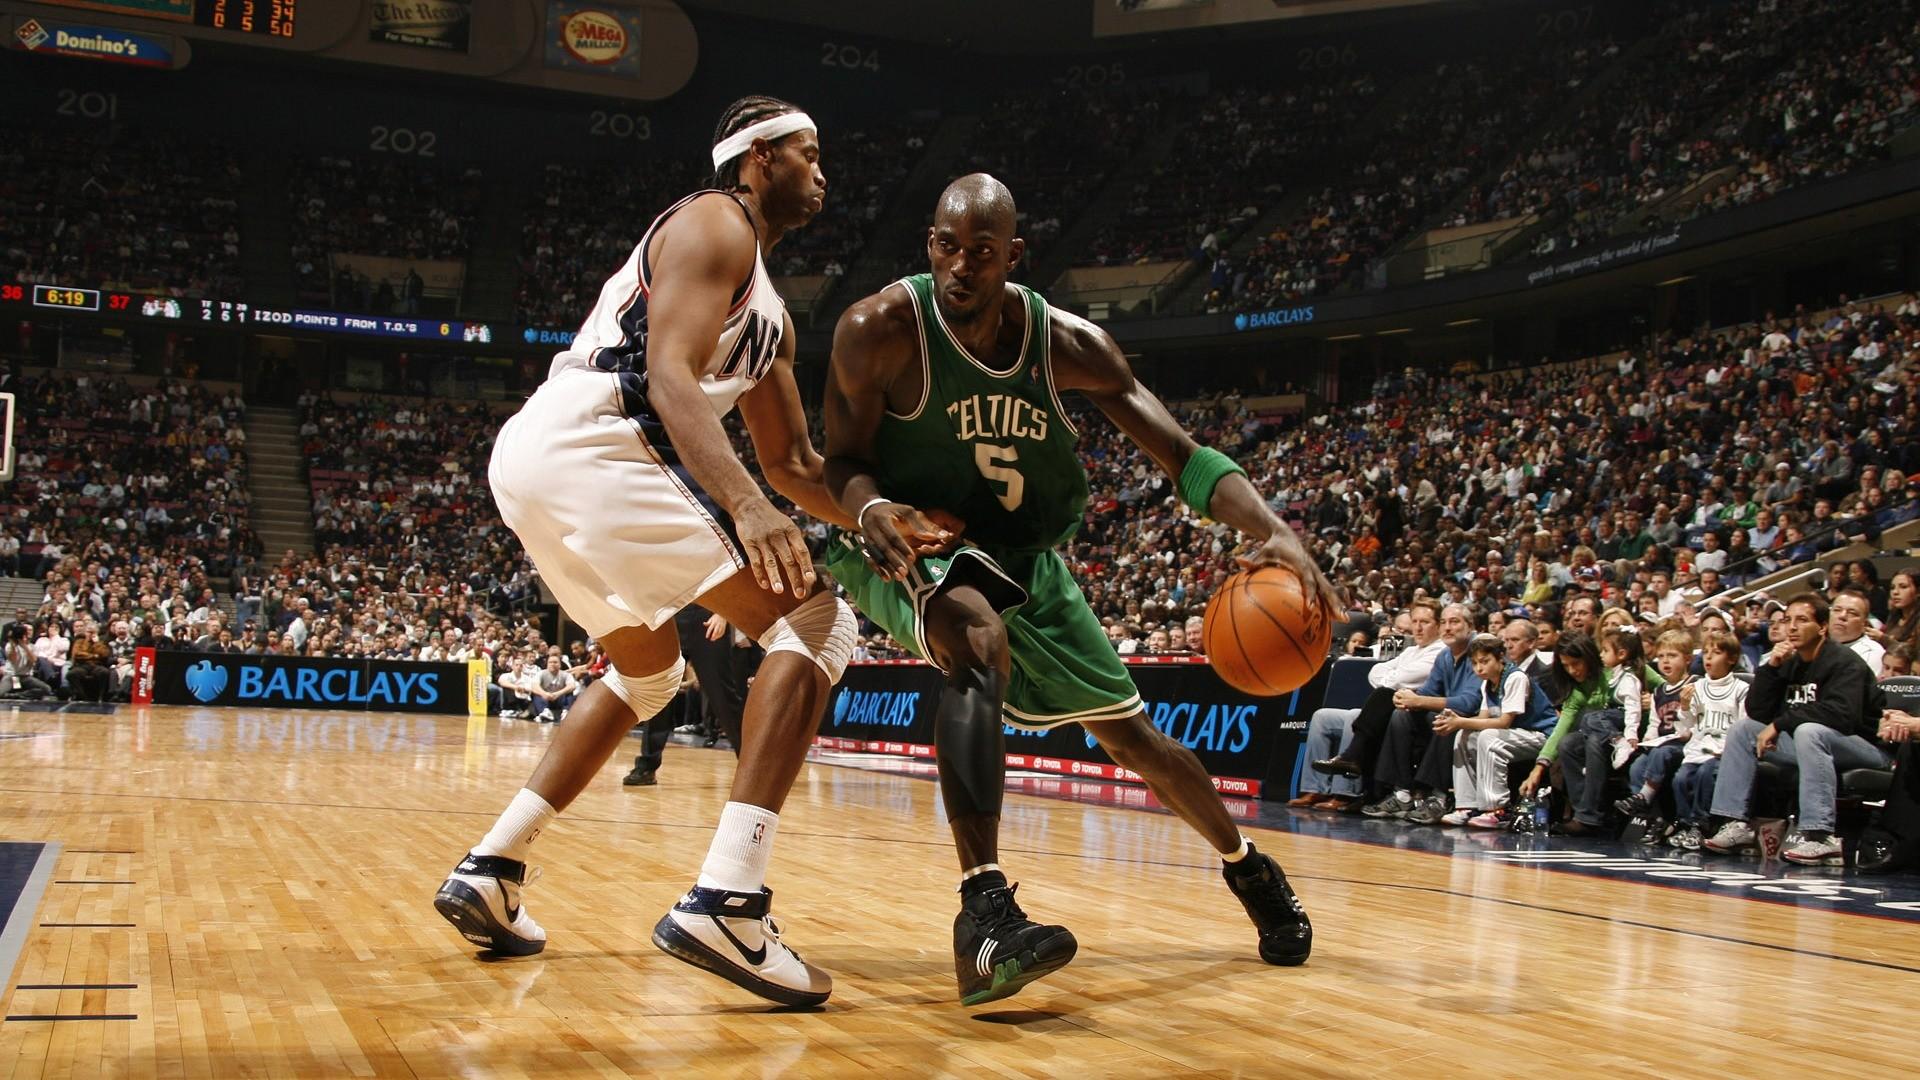 NBA Basketball Kevin Garnett Boston Celtics versus New Jersey Nets wallpaper